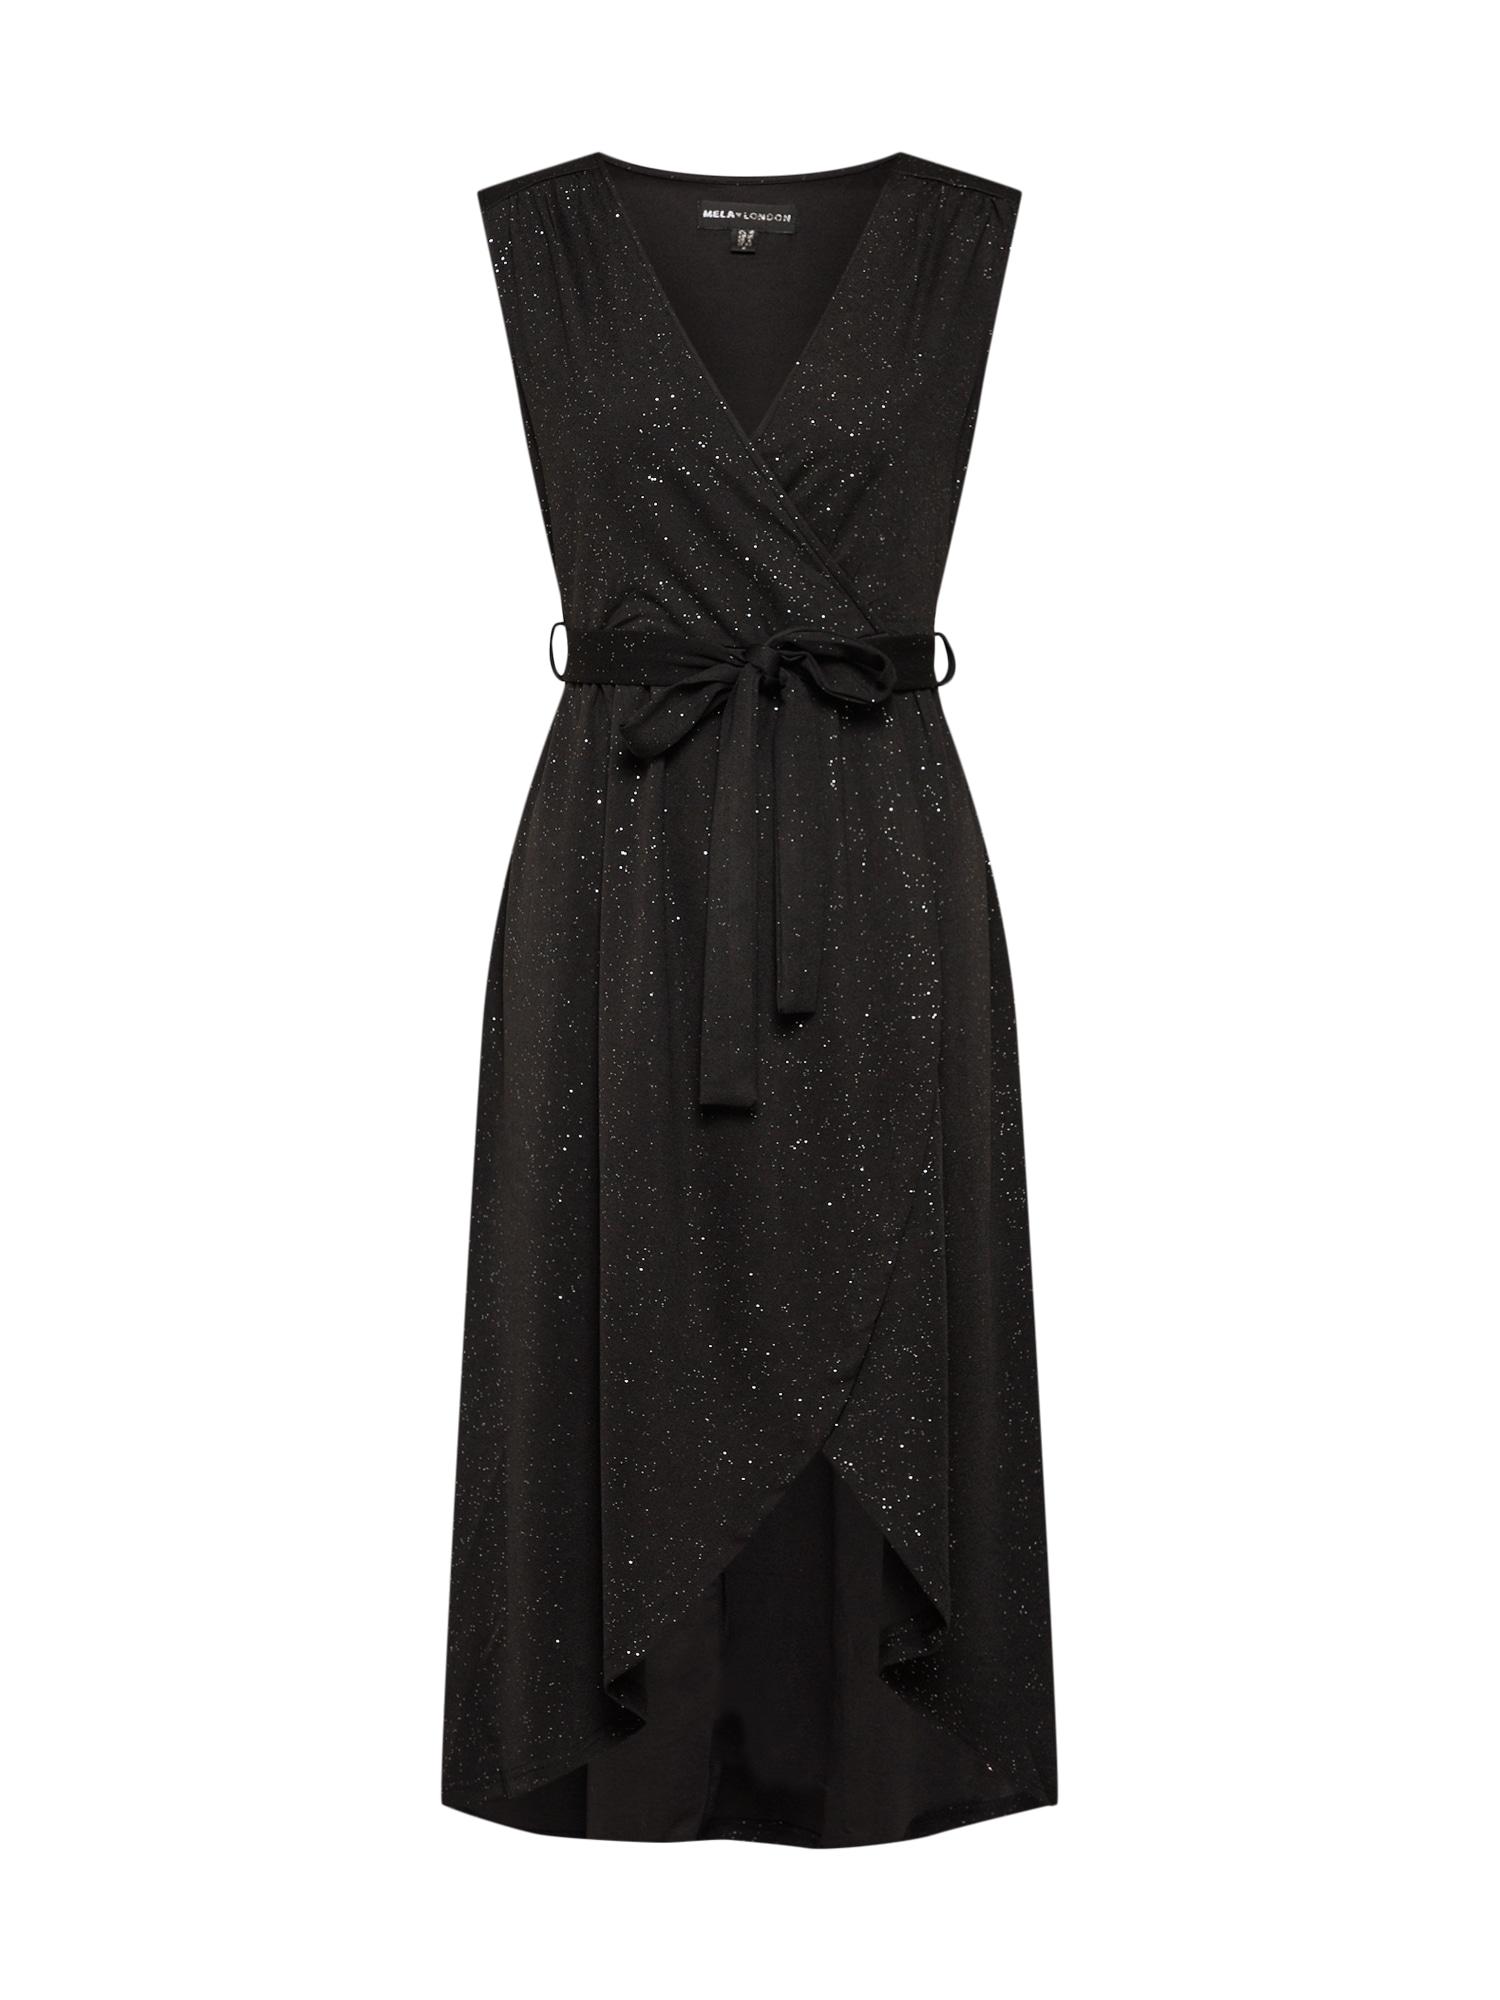 Šaty GLITZ MIDI DRESS černá stříbrná Mela London